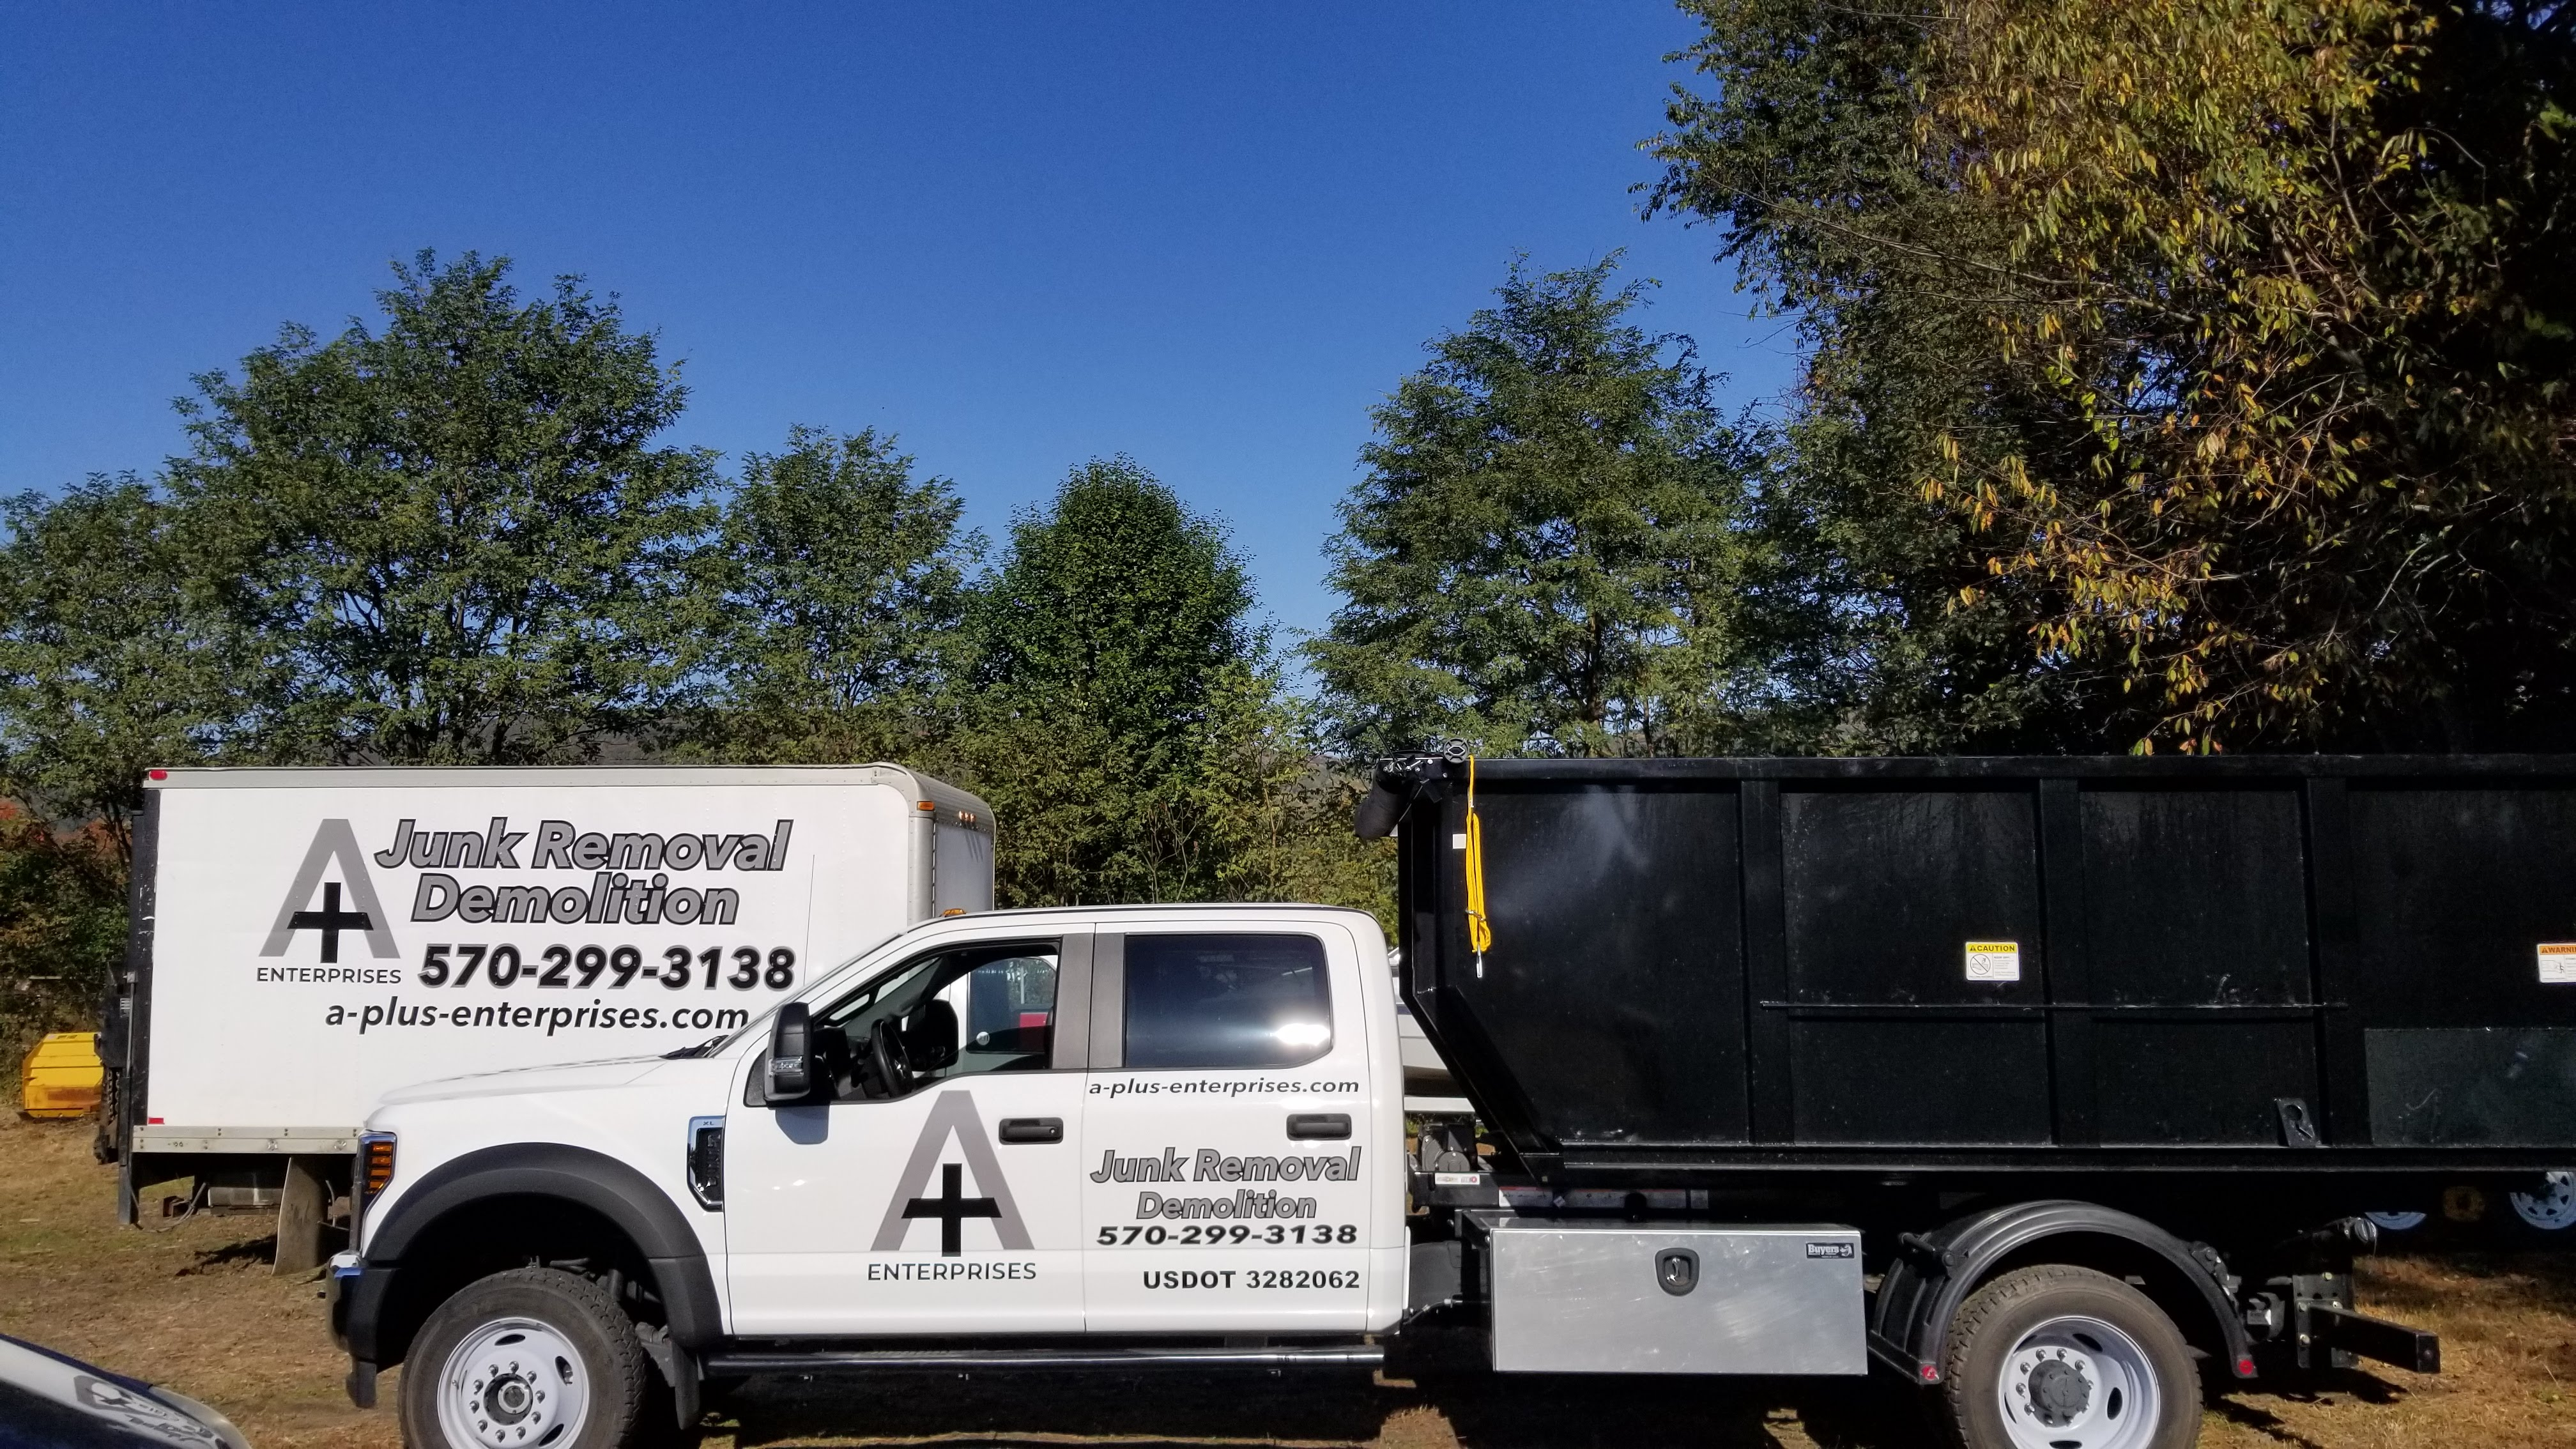 Junk Removal & Demolition Services NEPA